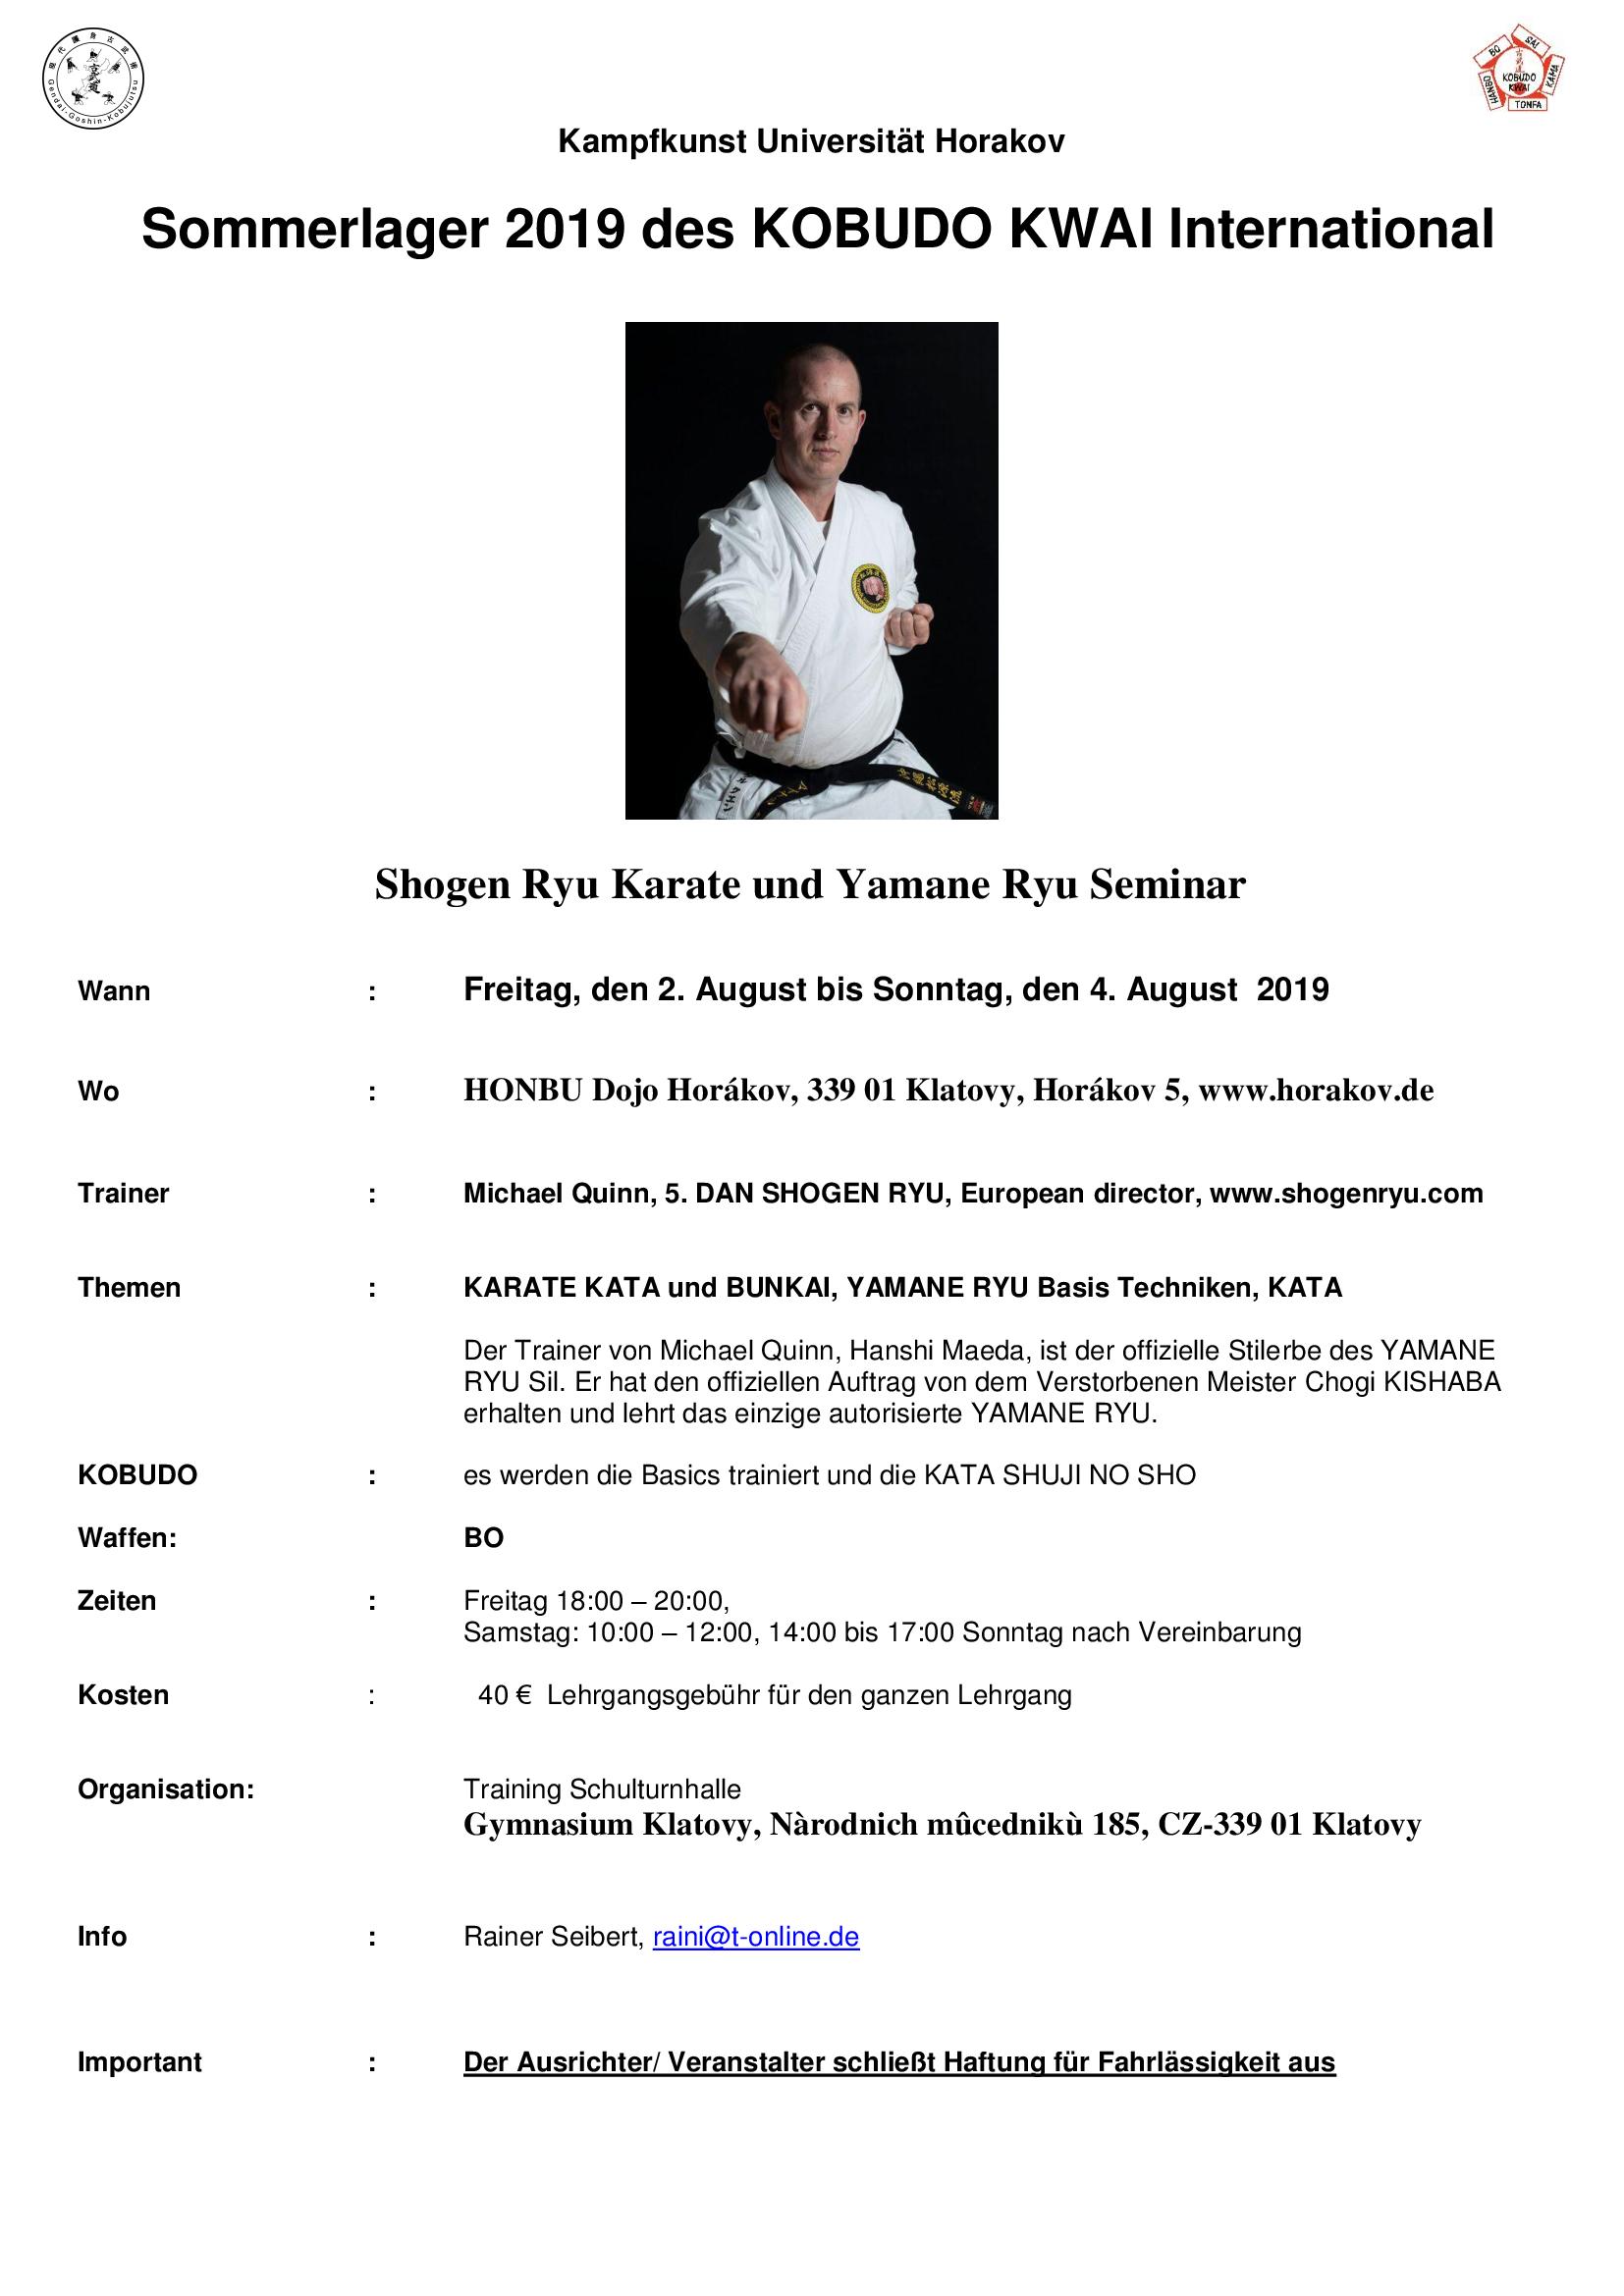 Quinn, Sensei will be teaching an open seminar on both Okinawan Shogen-Ryu karate and Yamane Ryu kobudo in a 3 day seminar in the Czech Republic